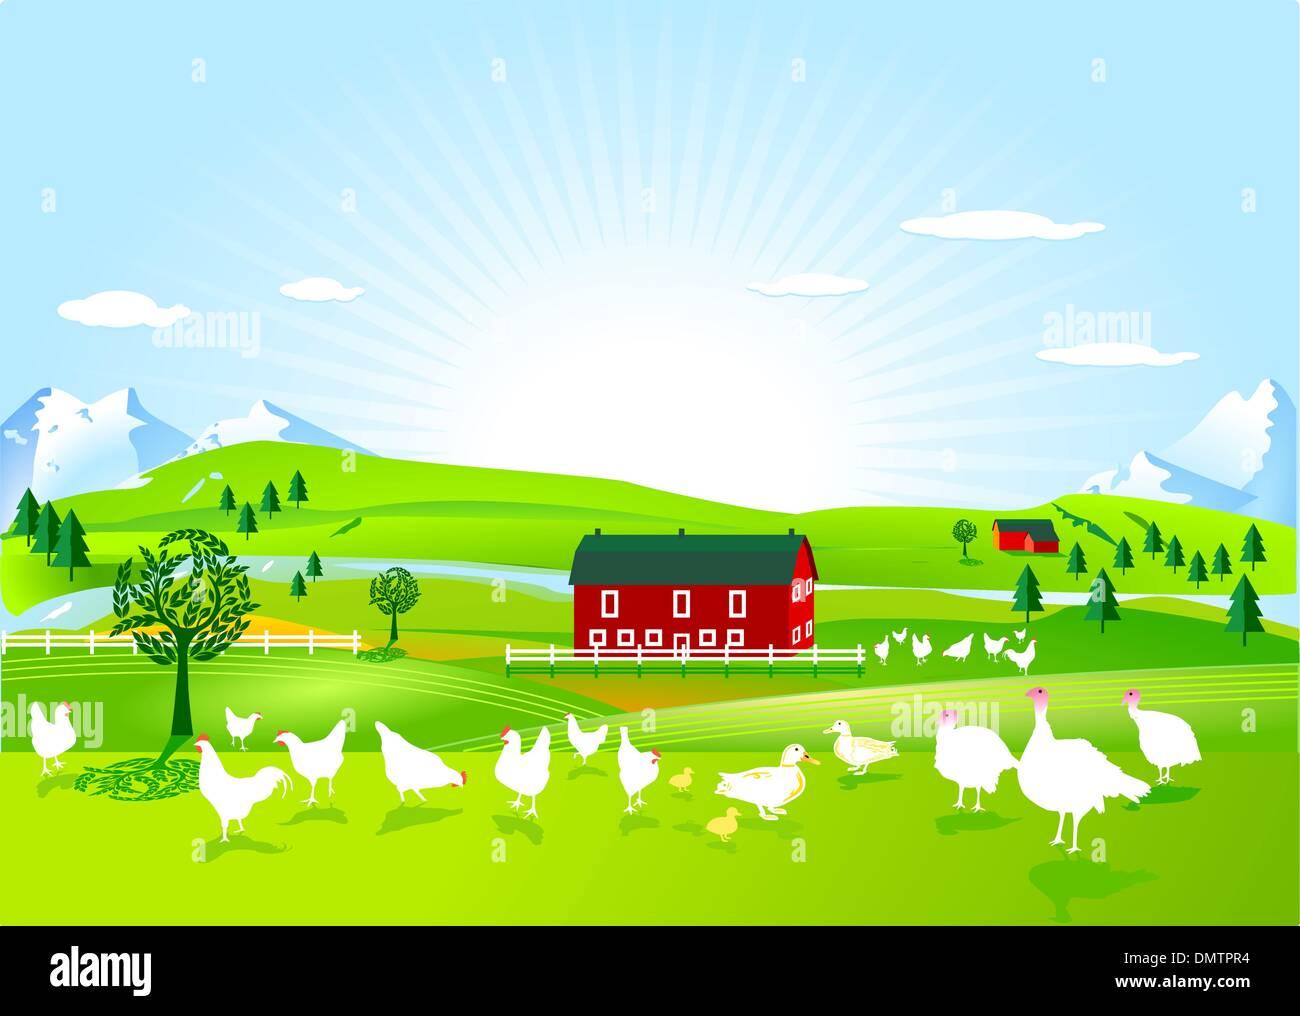 poultry farm - Stock Vector